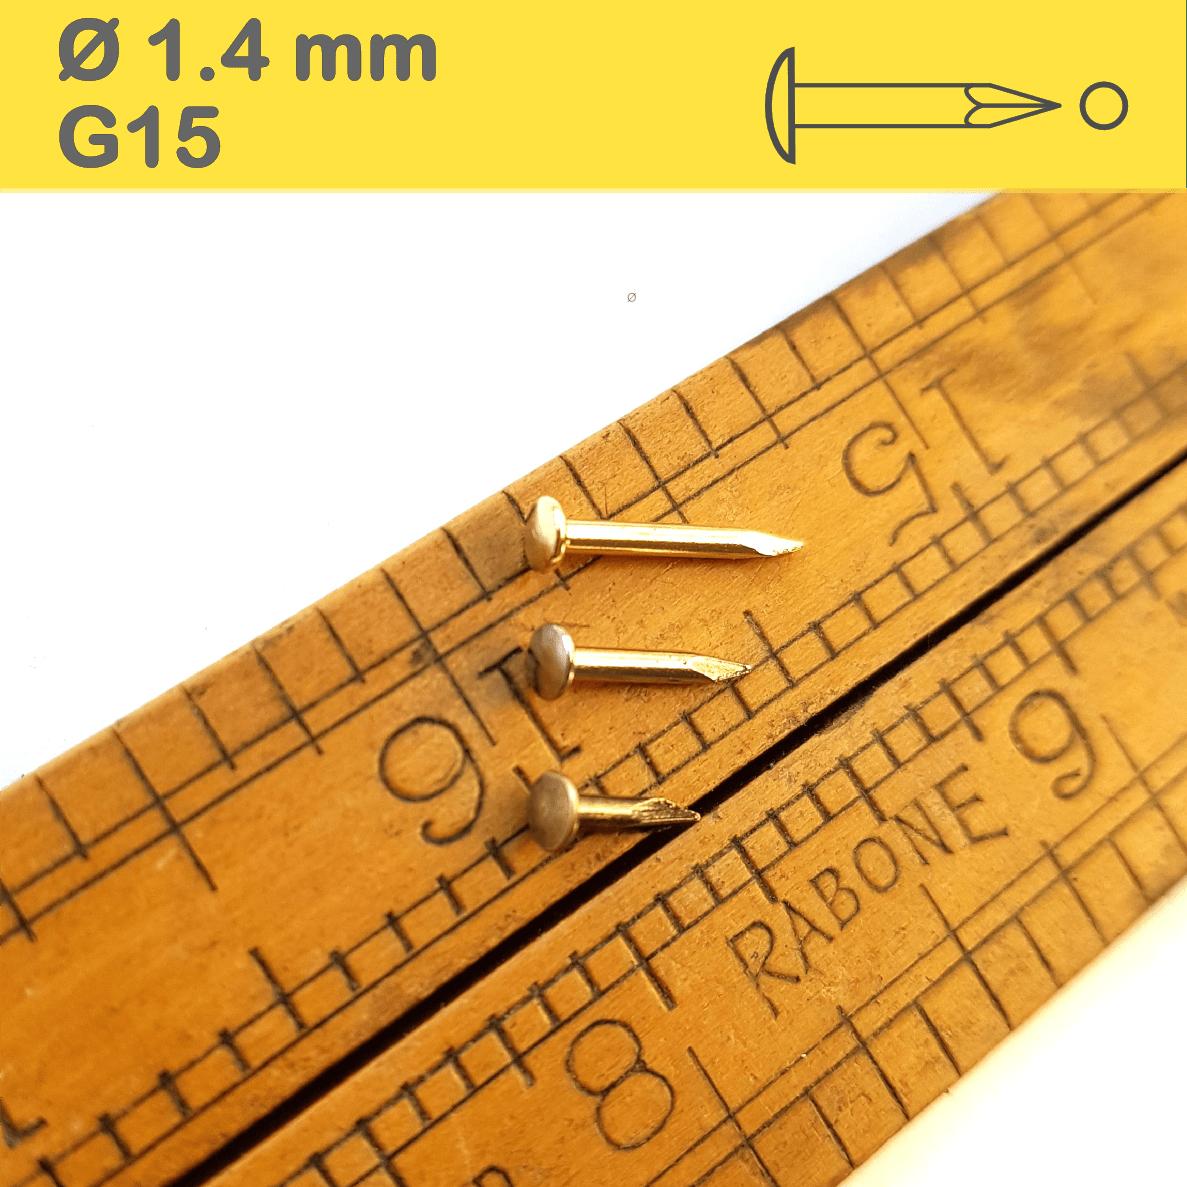 Shiny Brass-Plated Nails